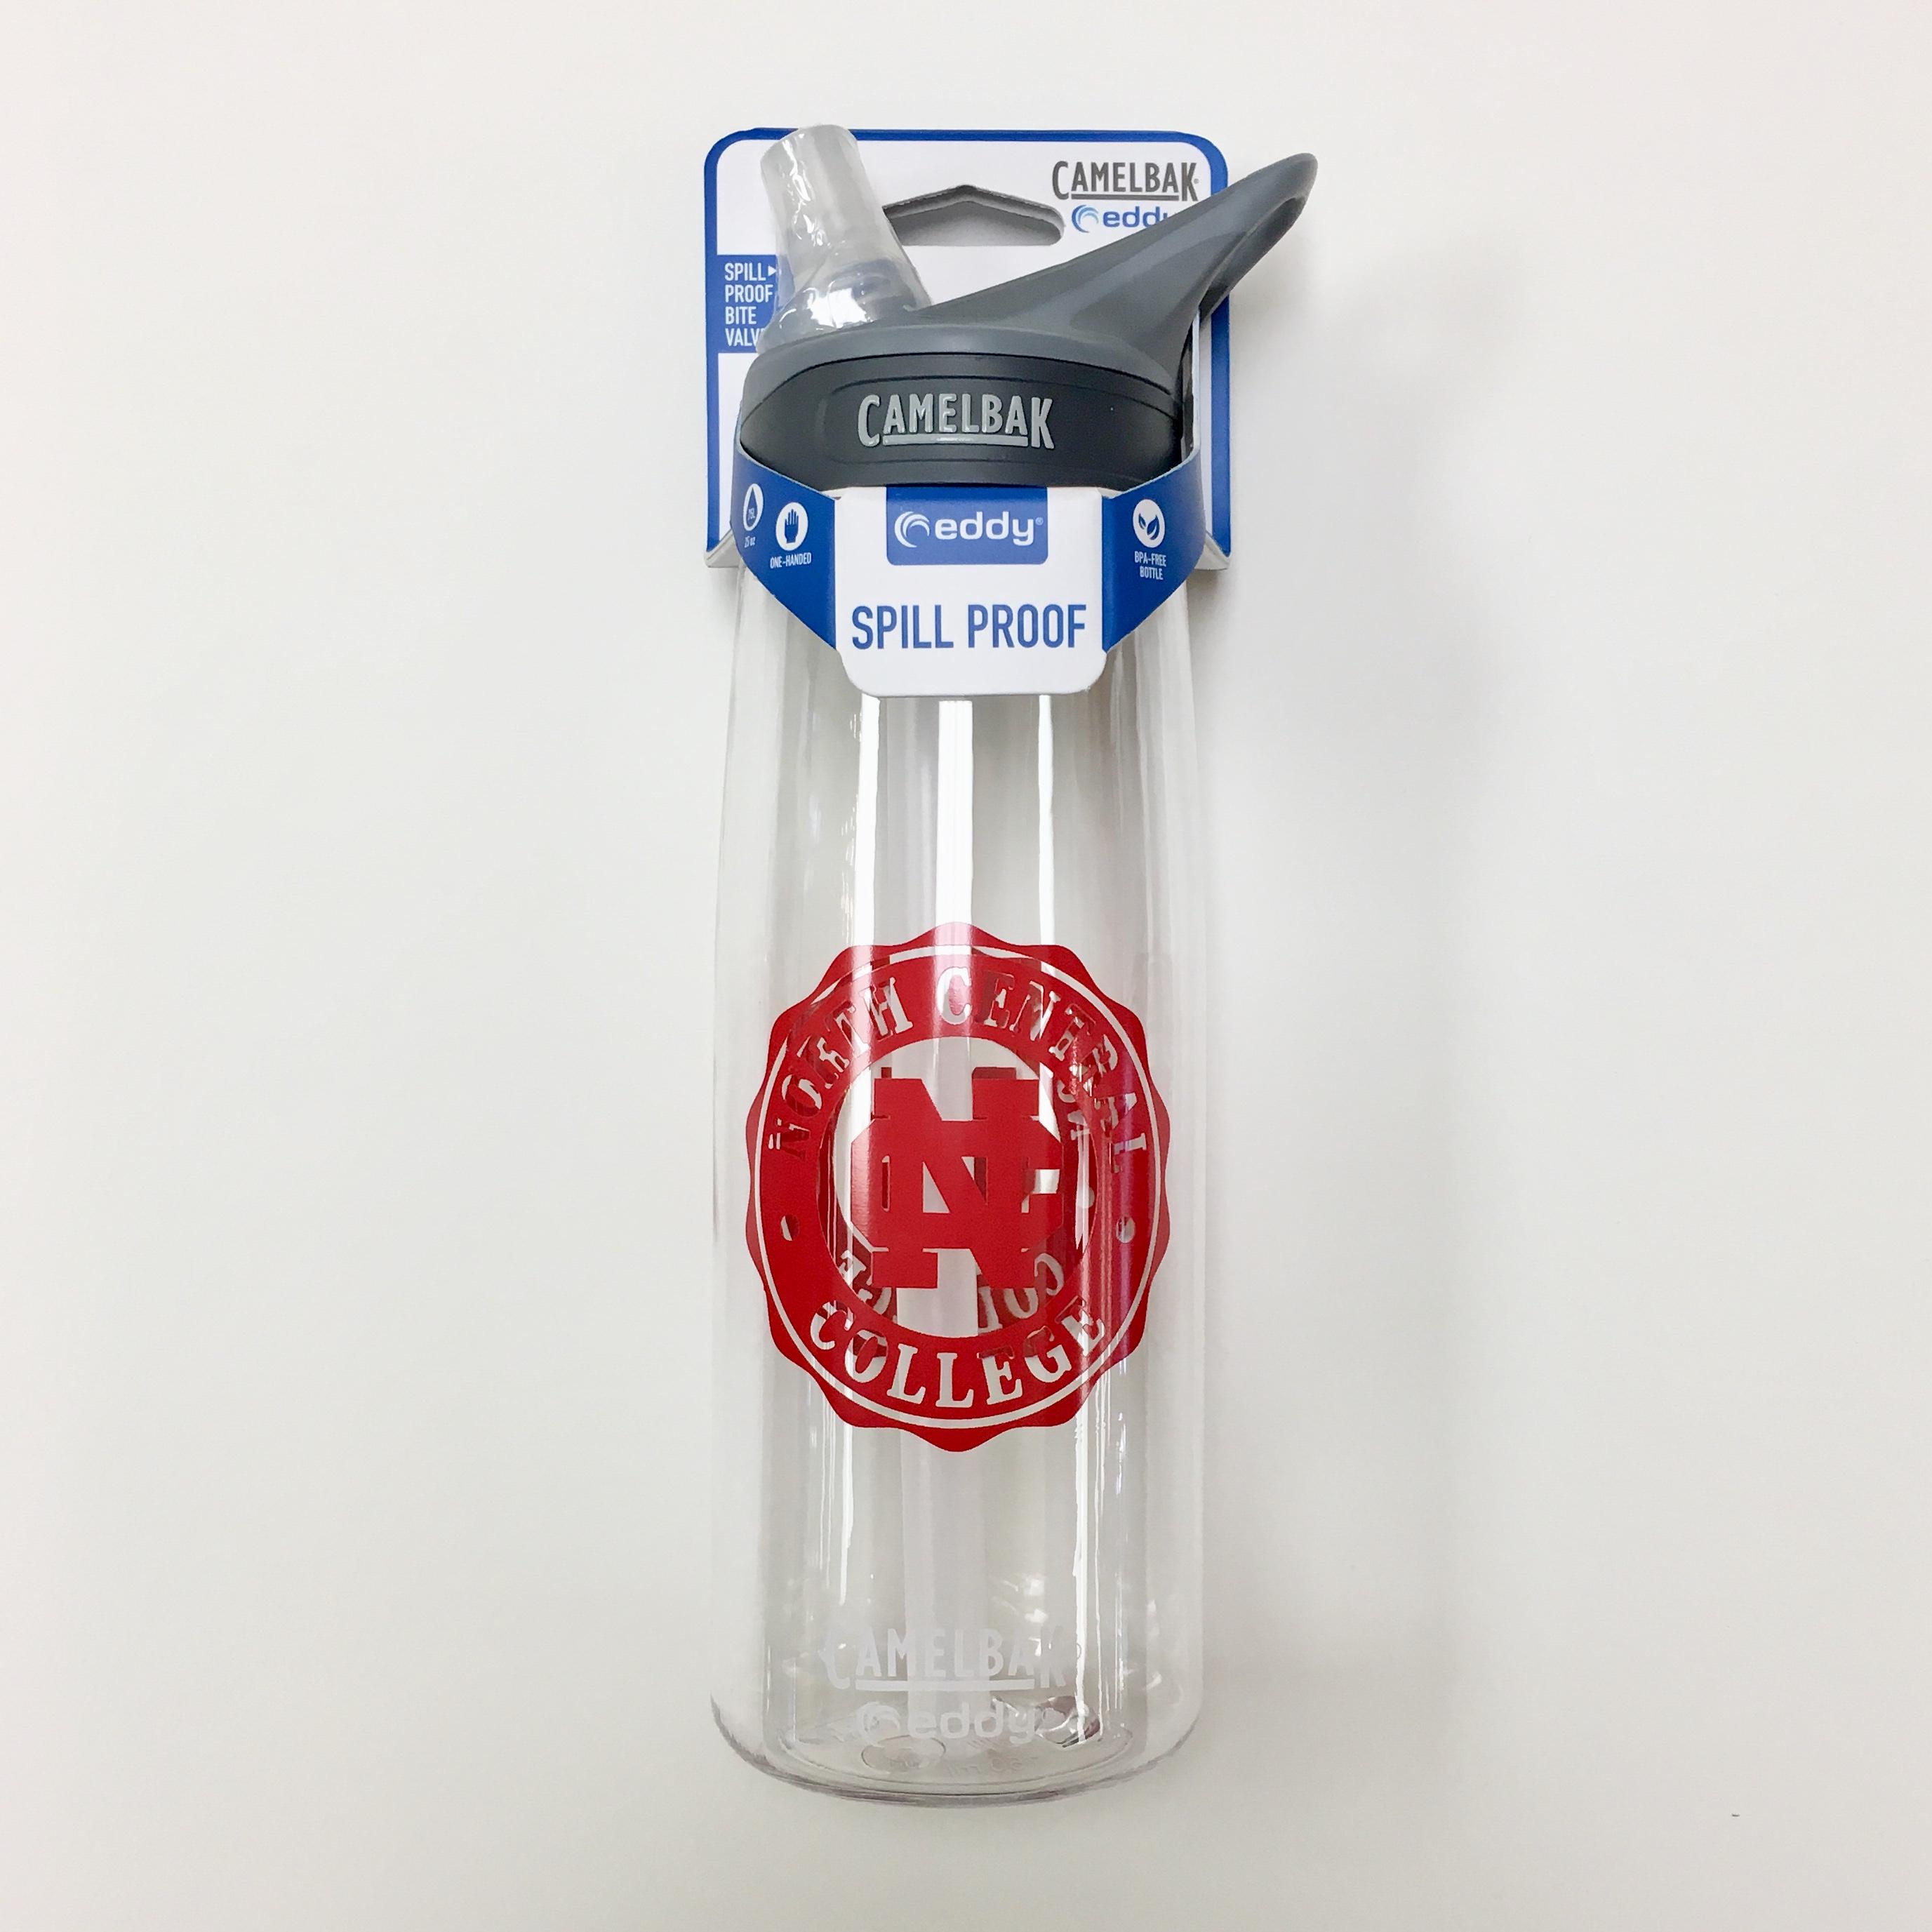 Image for the CamelBak Spill Proof Byte Valve Water Bottle w/Logo product